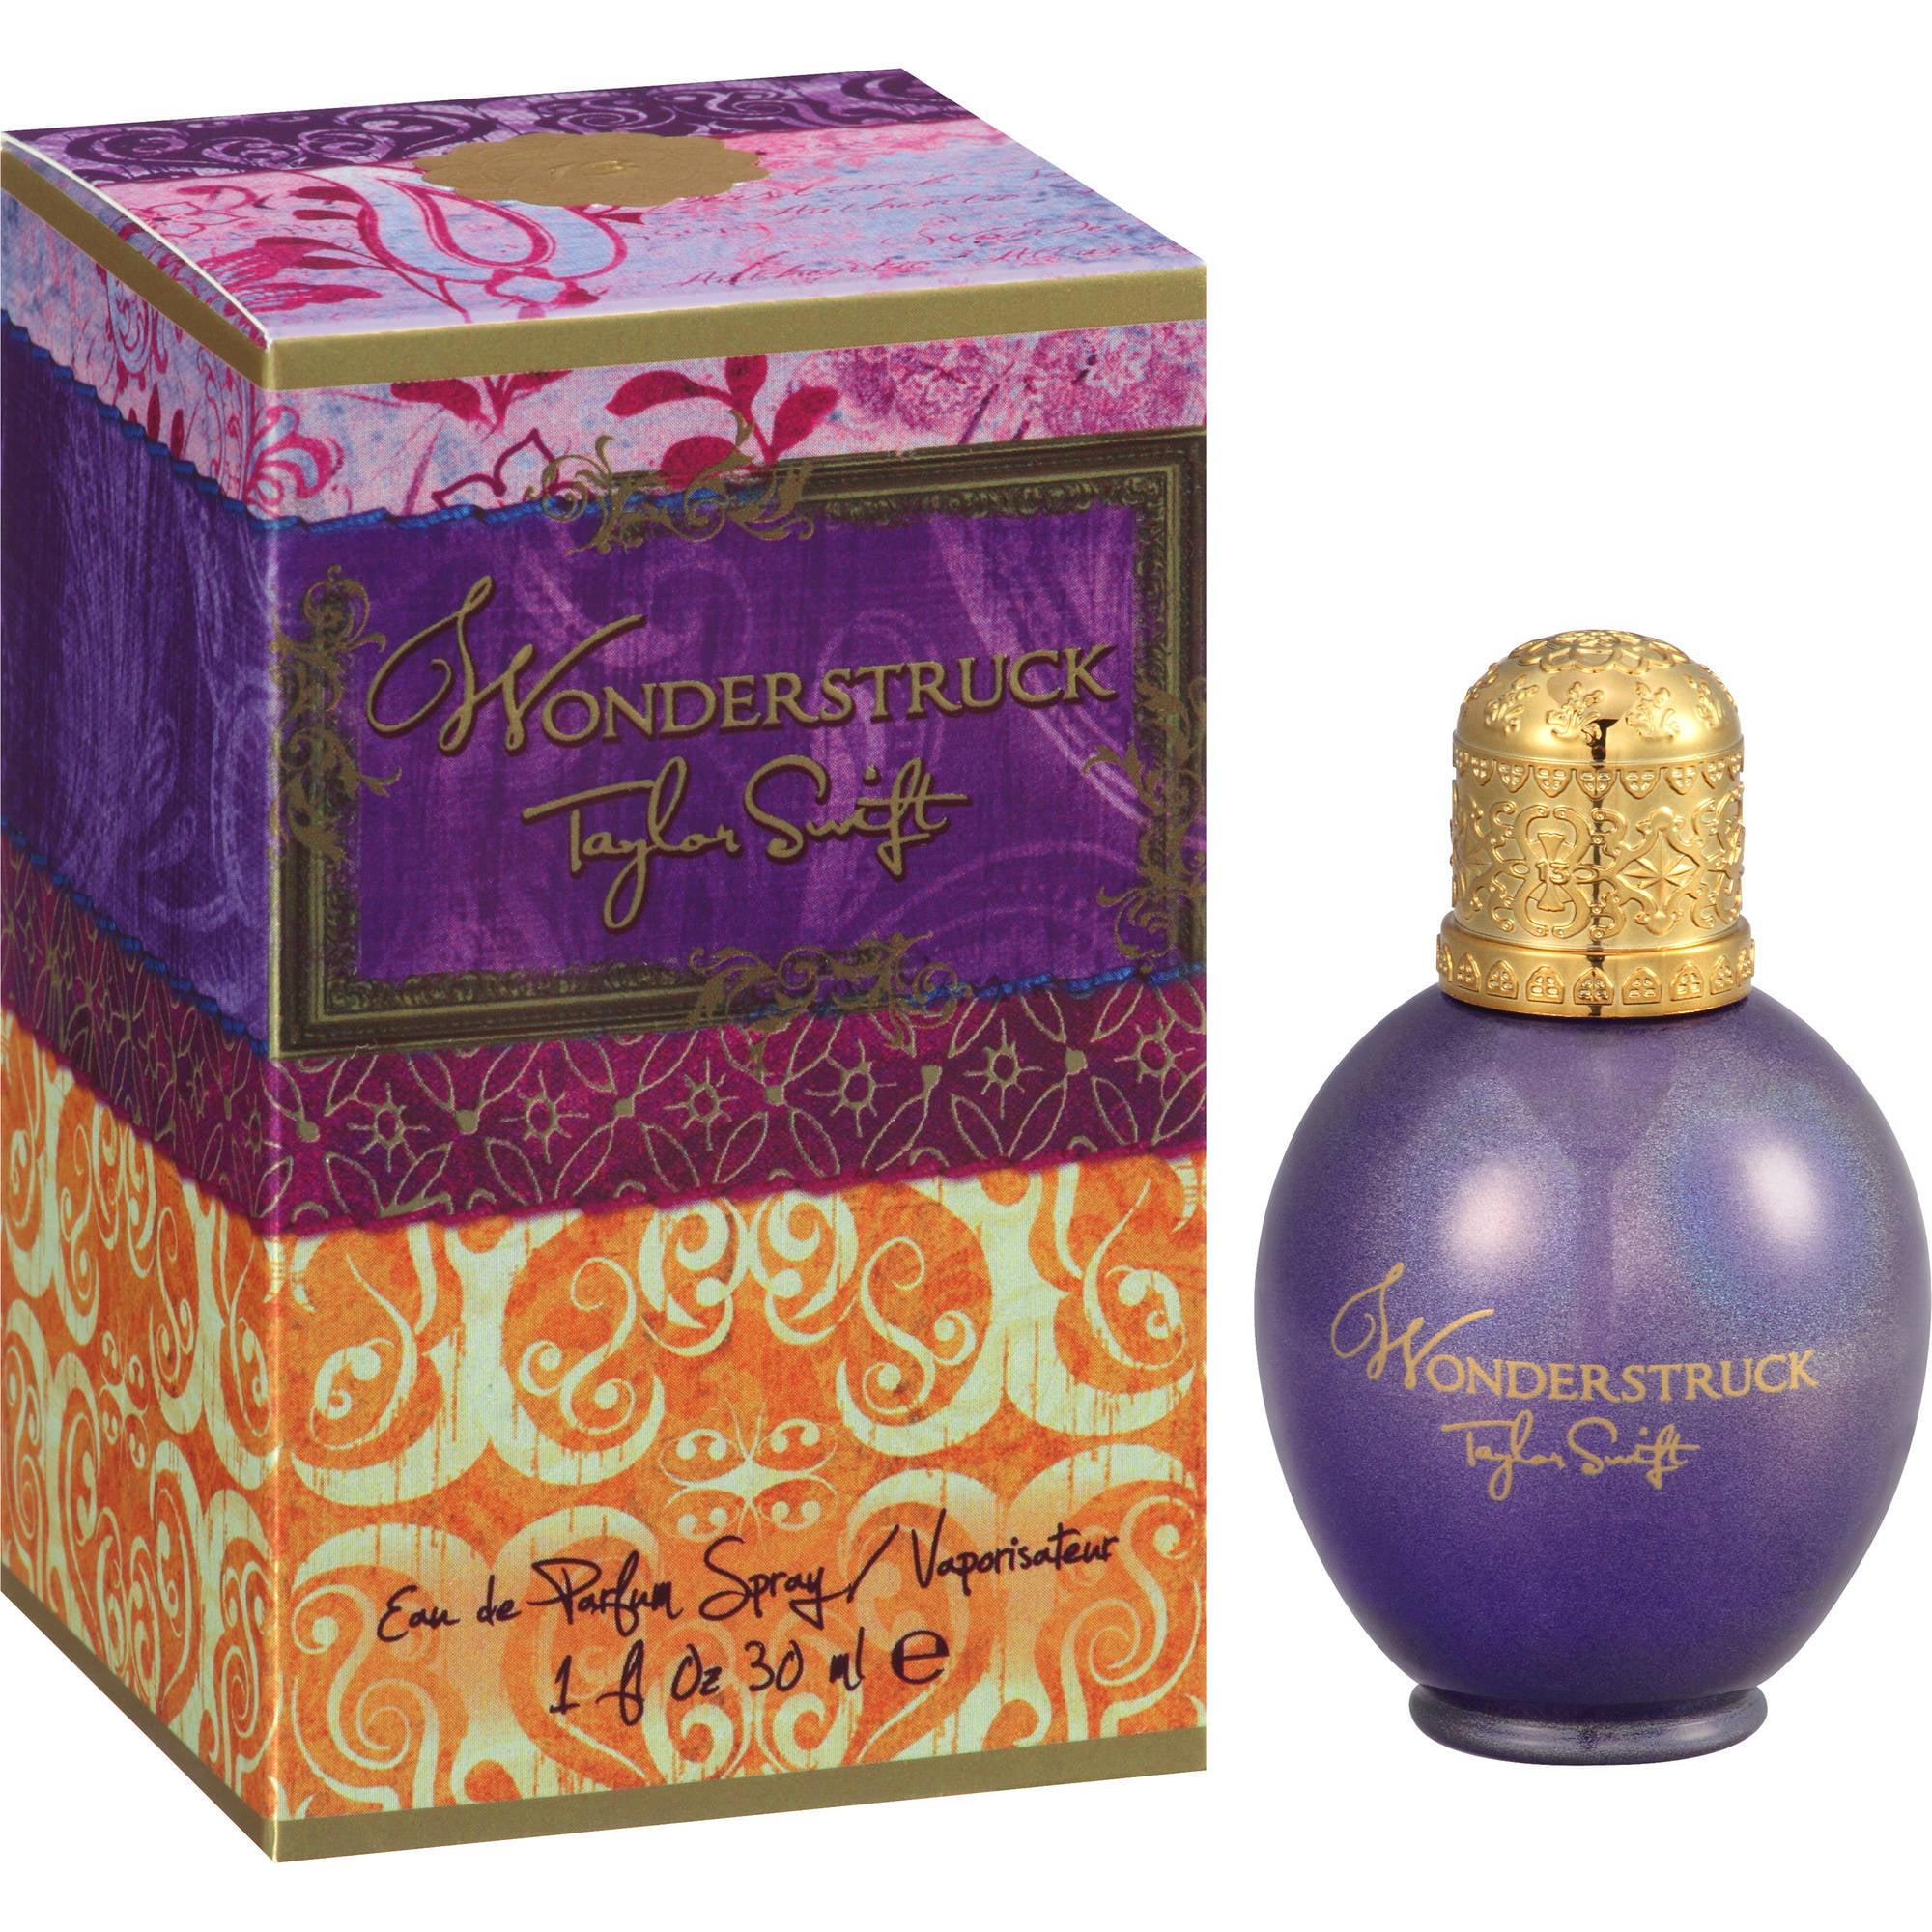 Taylor Swift Wonderstruck Eau de Parfum, 1 fl oz